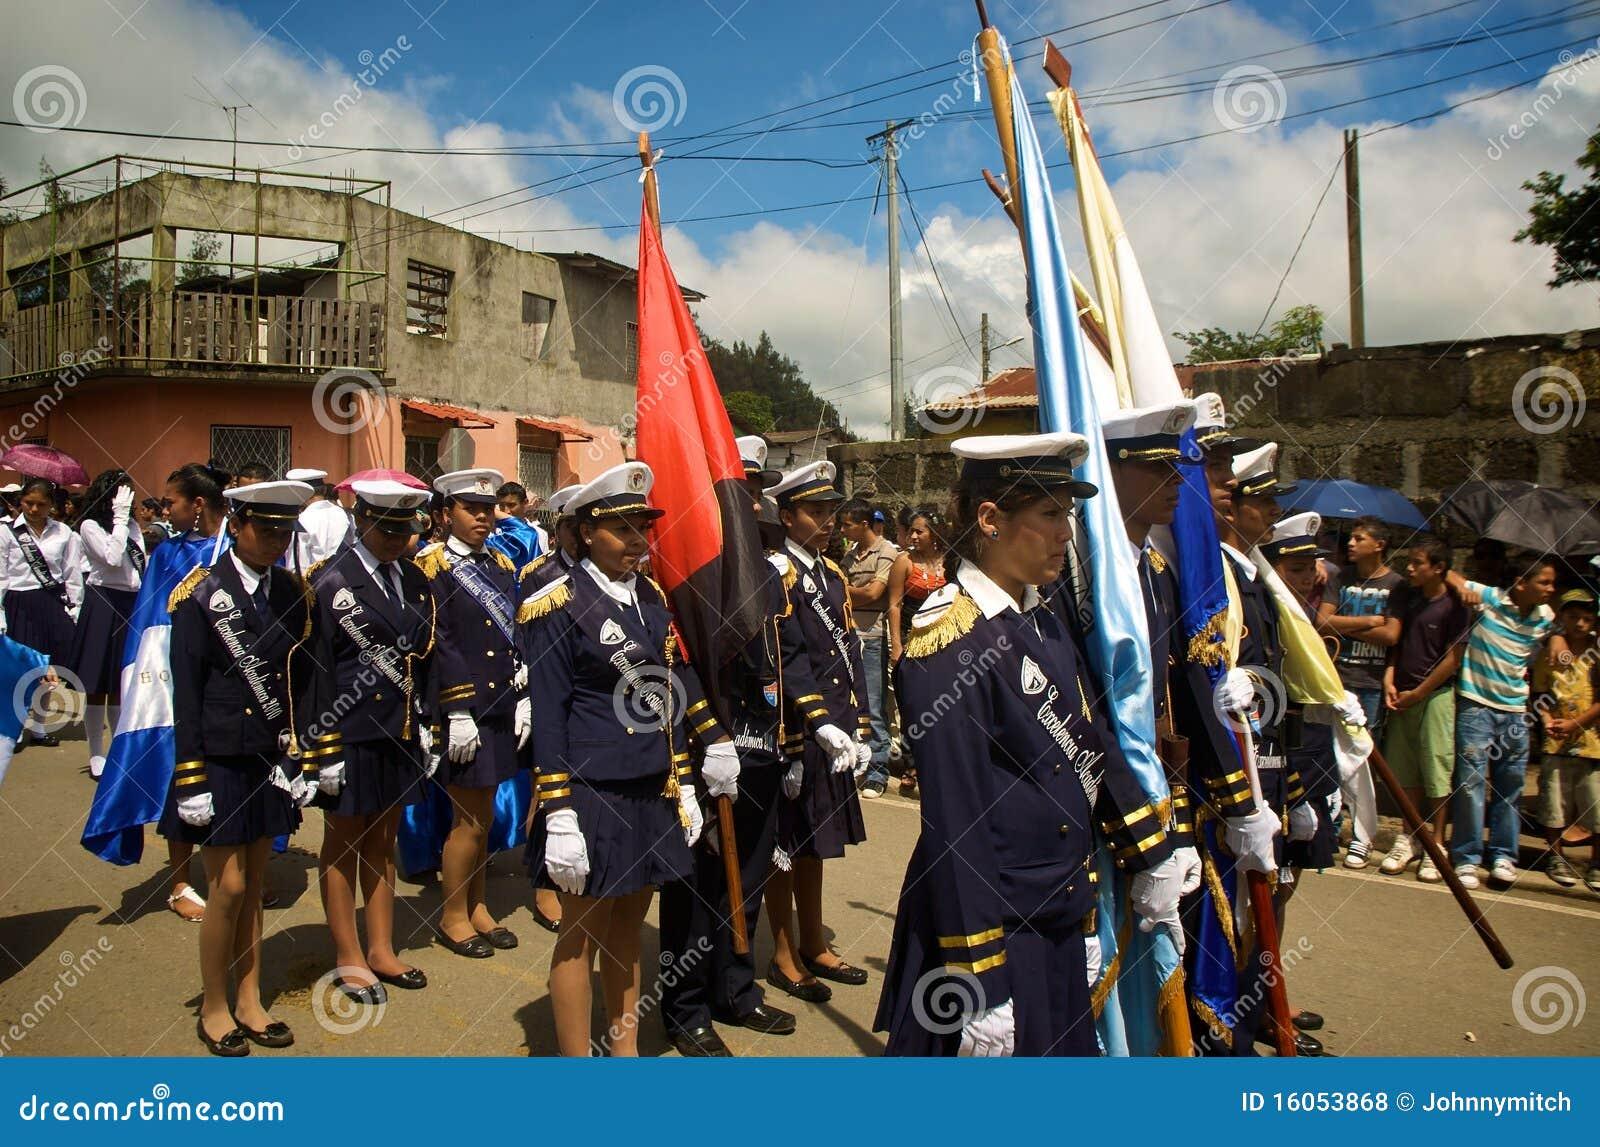 Latino Students Marching